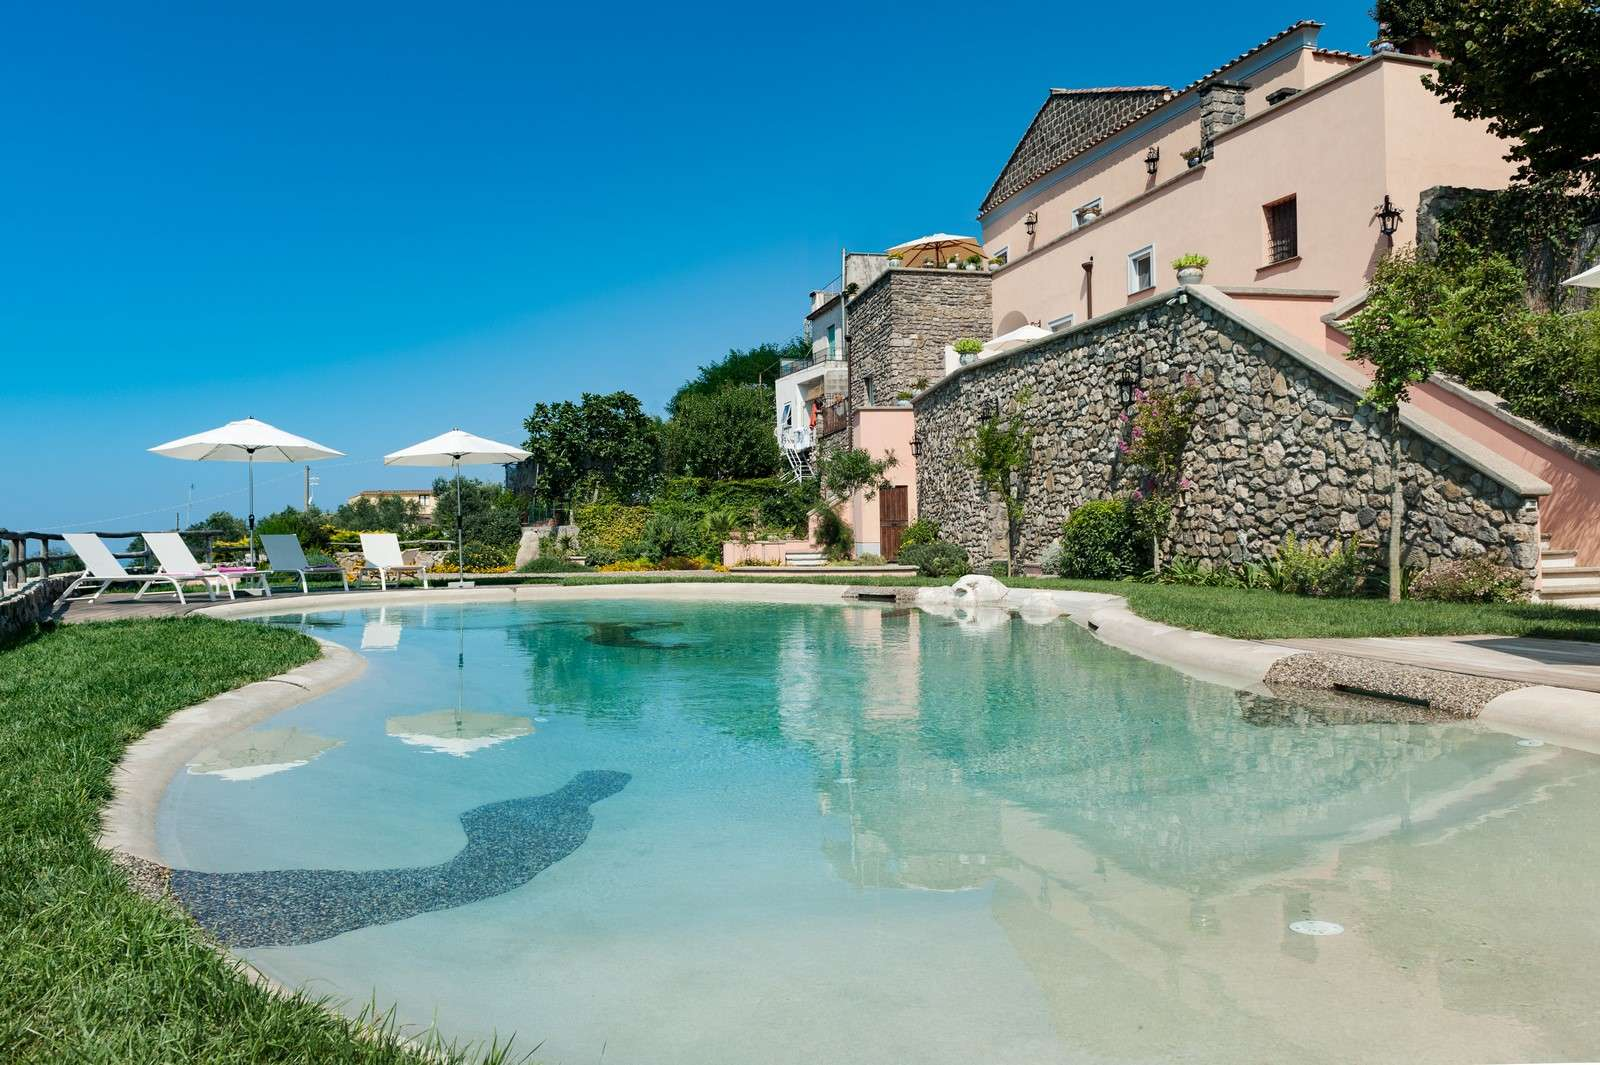 Luxury vacation rentals europe - Italy - Amalfi coast - Termini - Sophia - Image 1/38